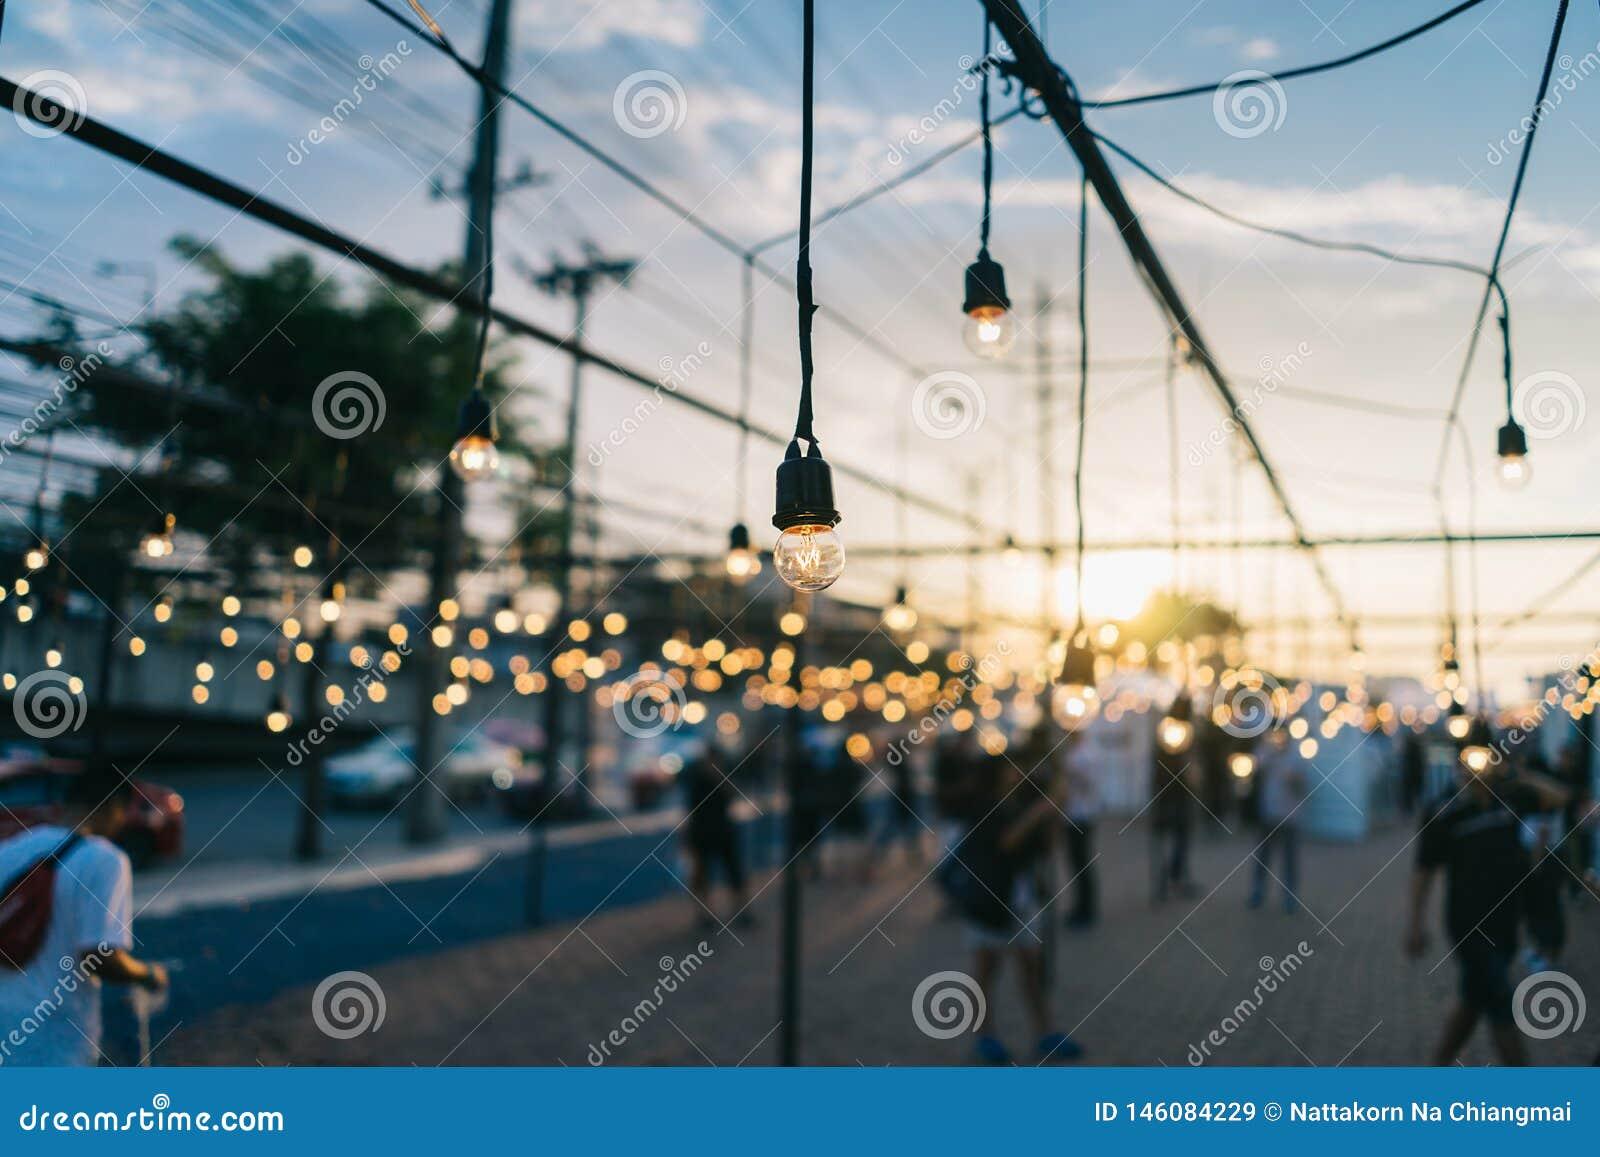 Bombilla, al aire libre decorativo en el festival del borde de la carretera